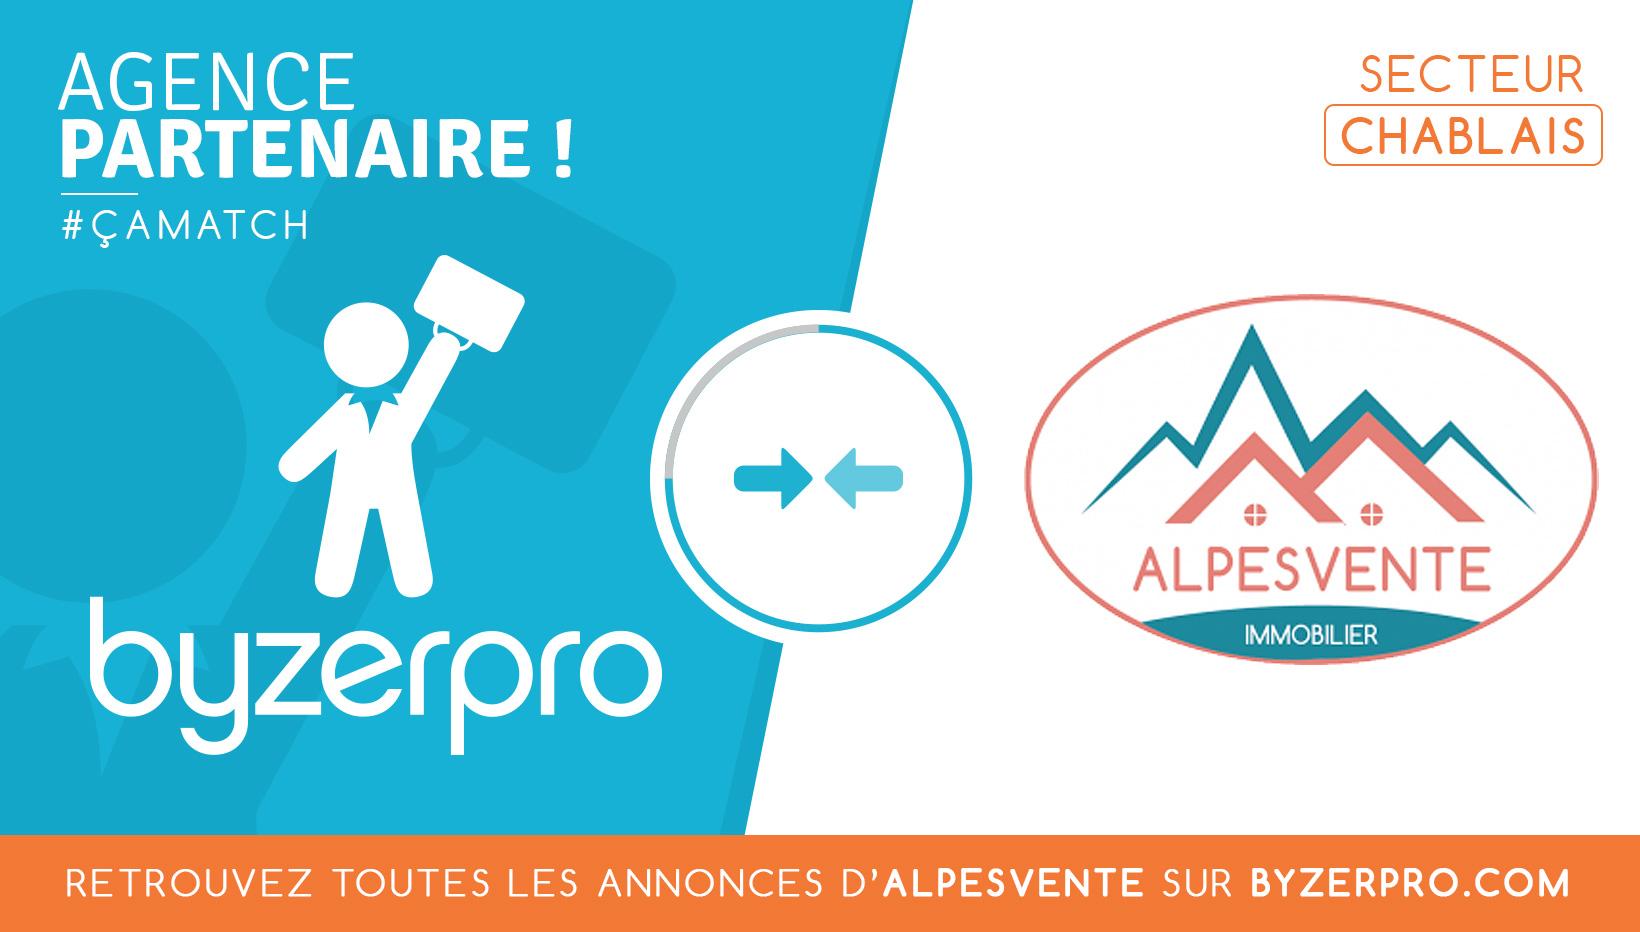 AlpesVente, partenaire Byzerpro.com